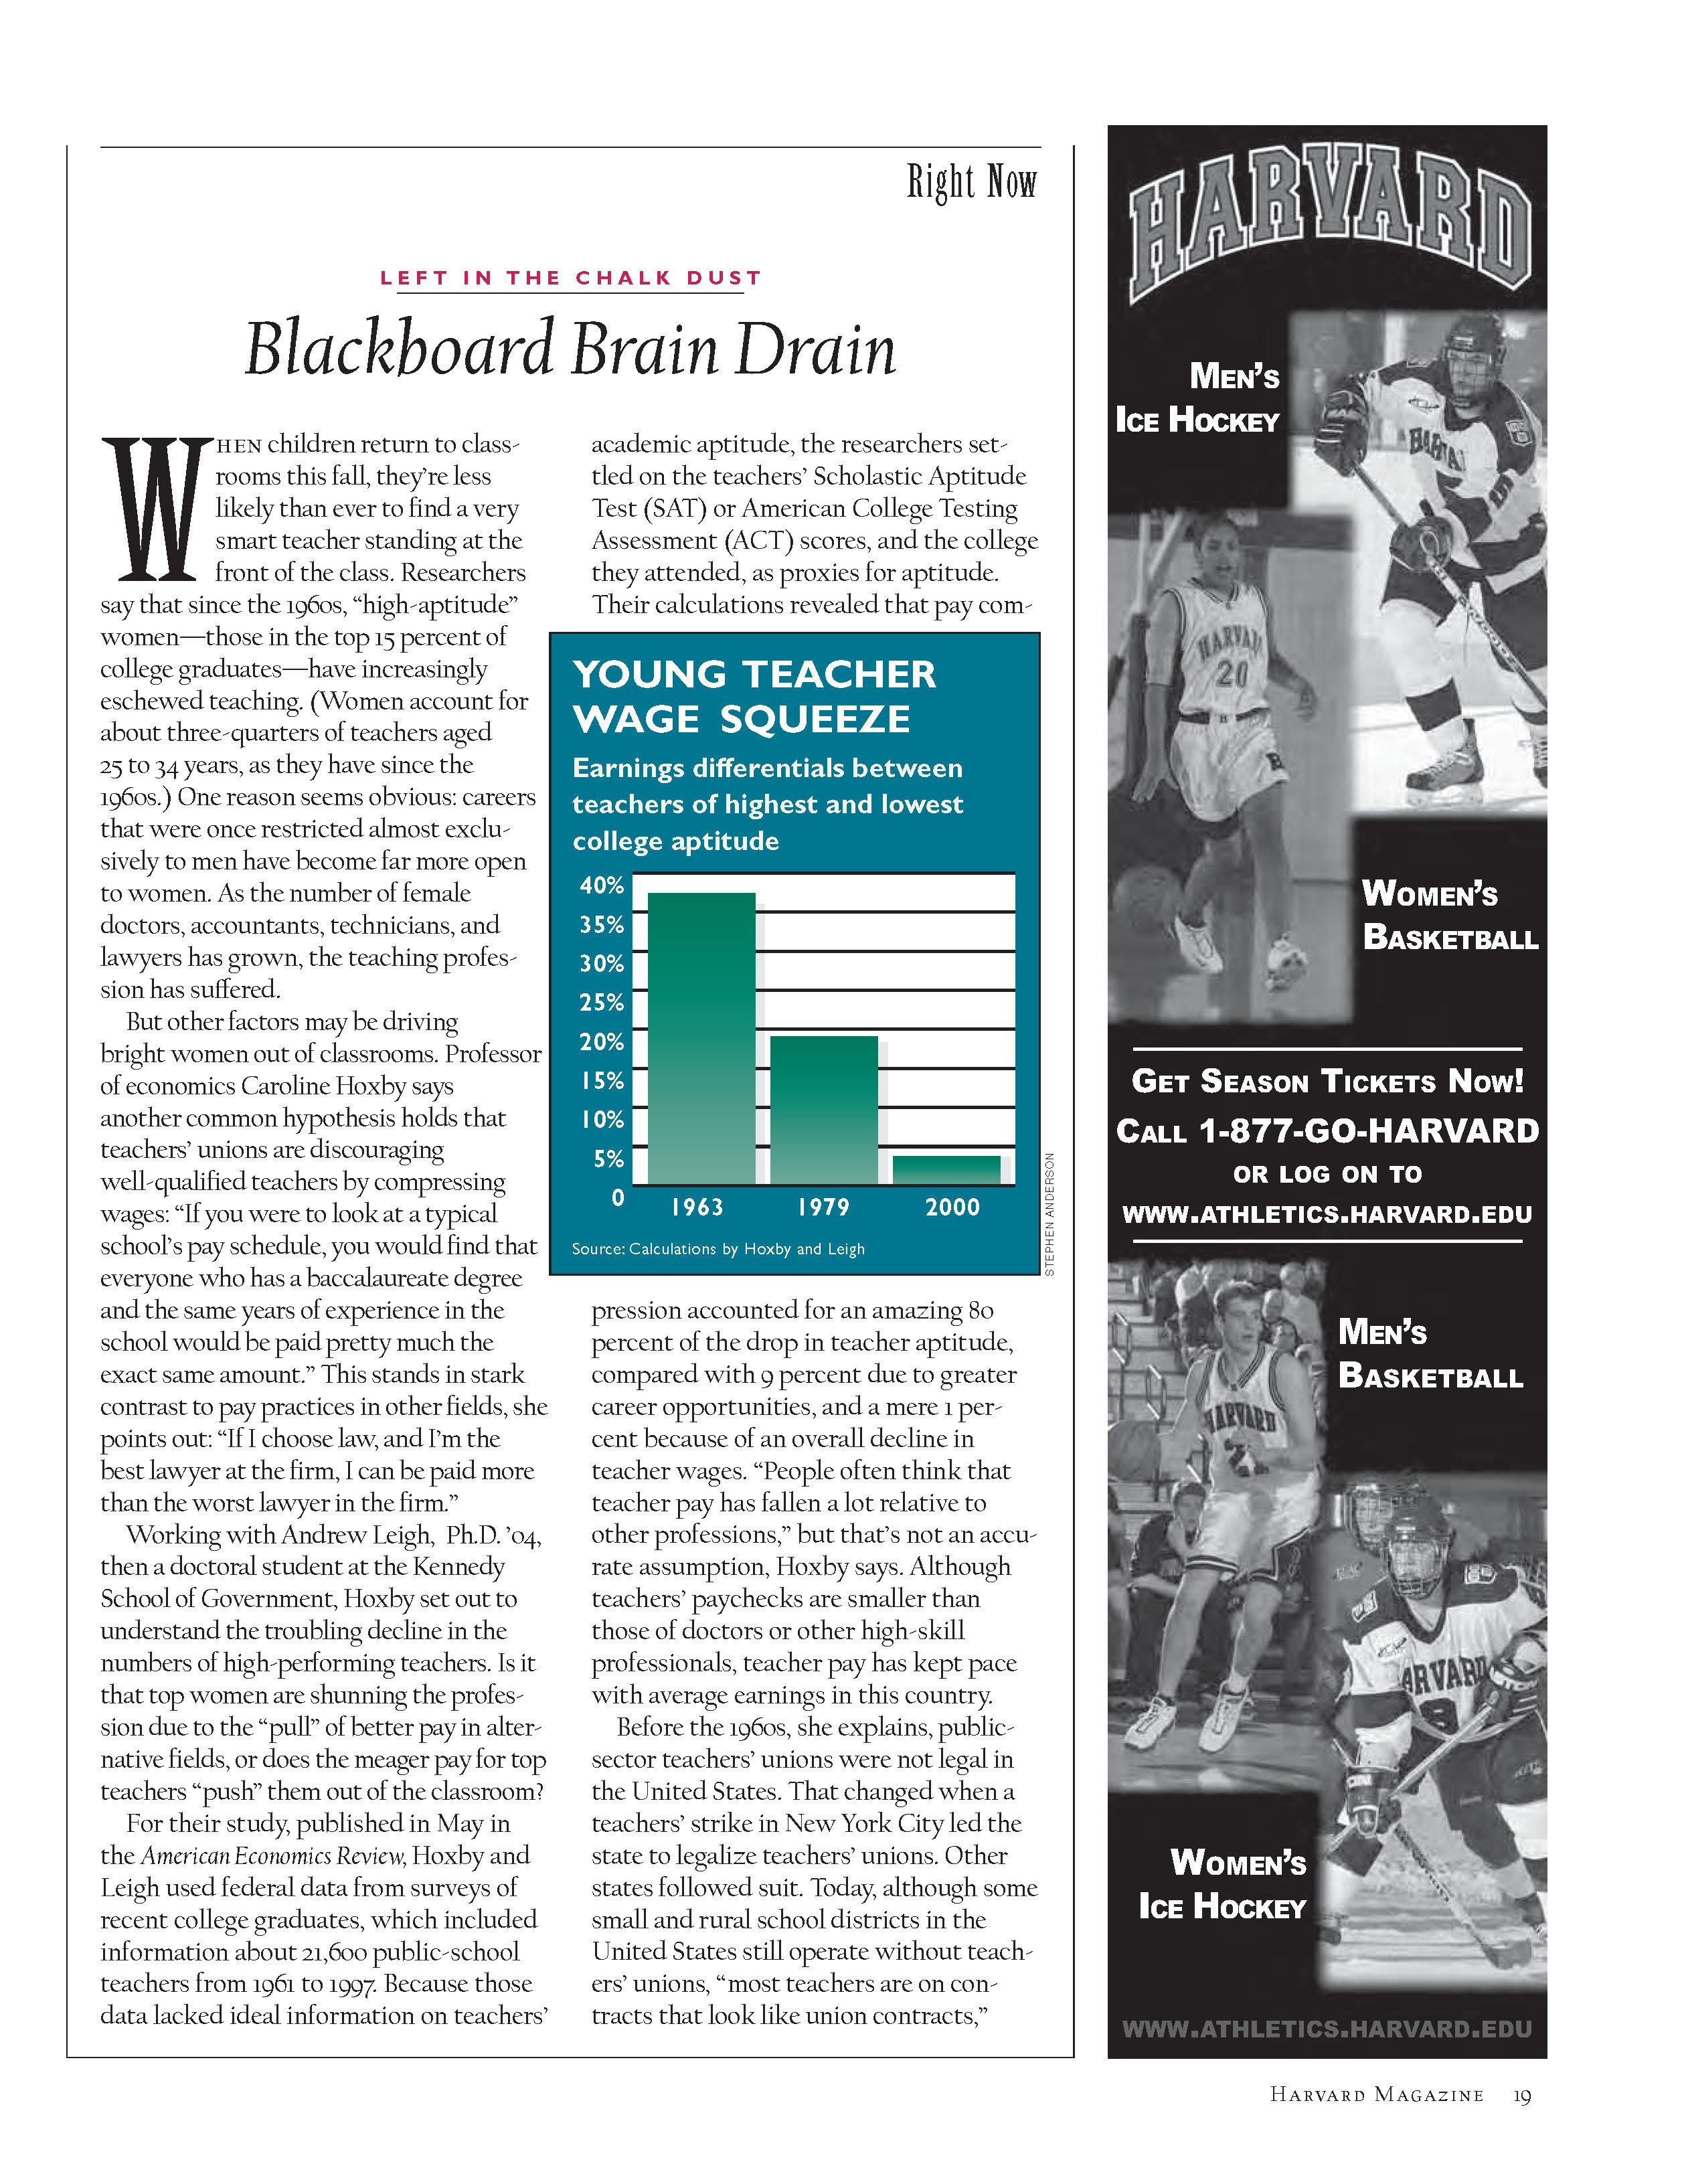 Blackboard Brain Drain